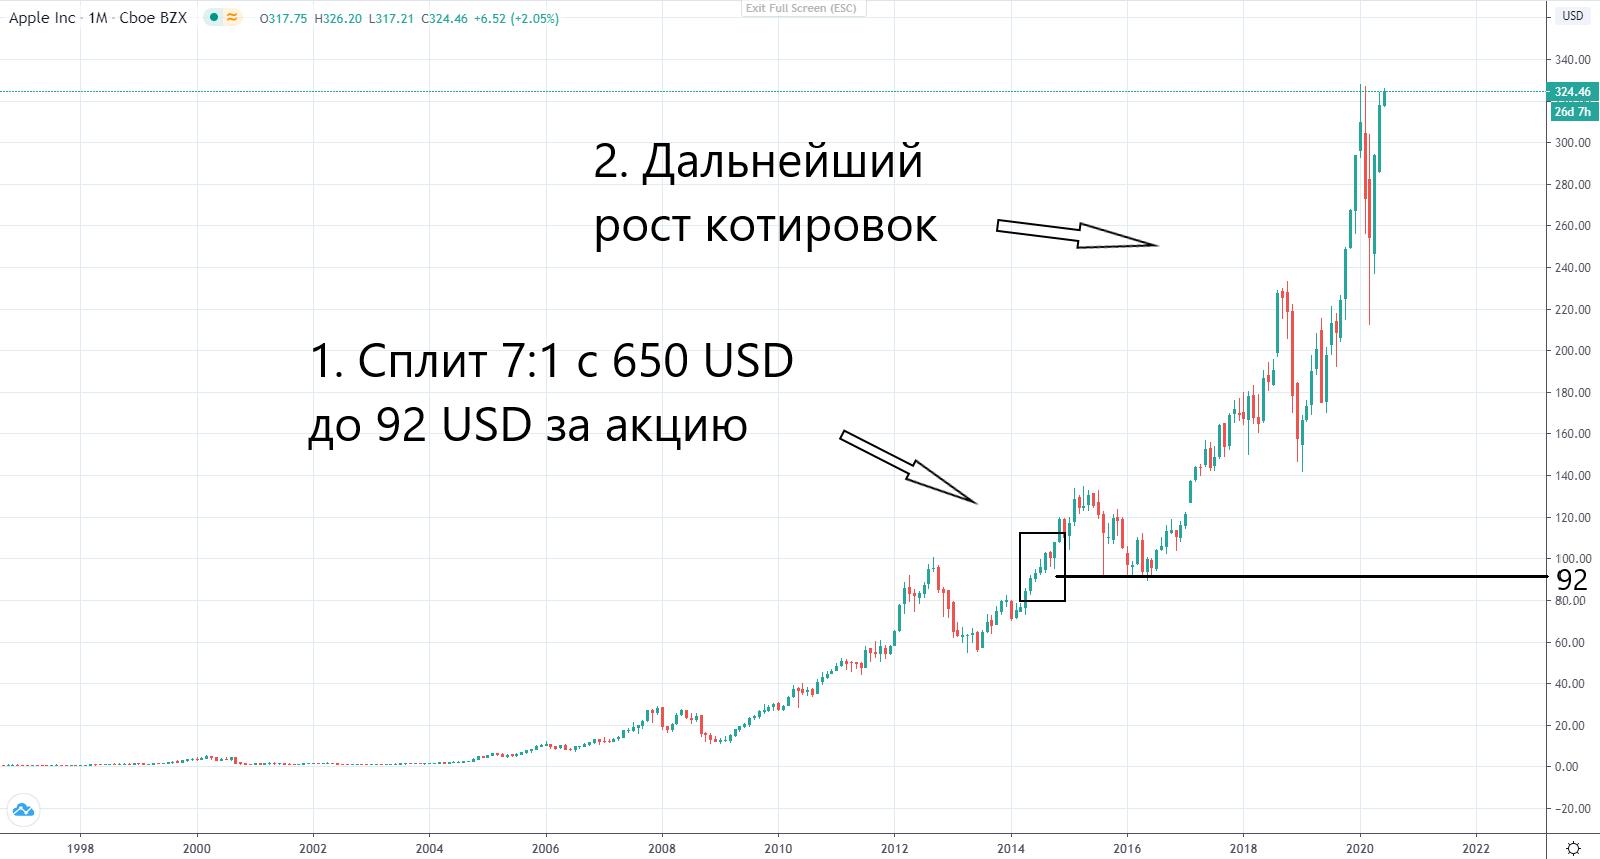 Сплит акций